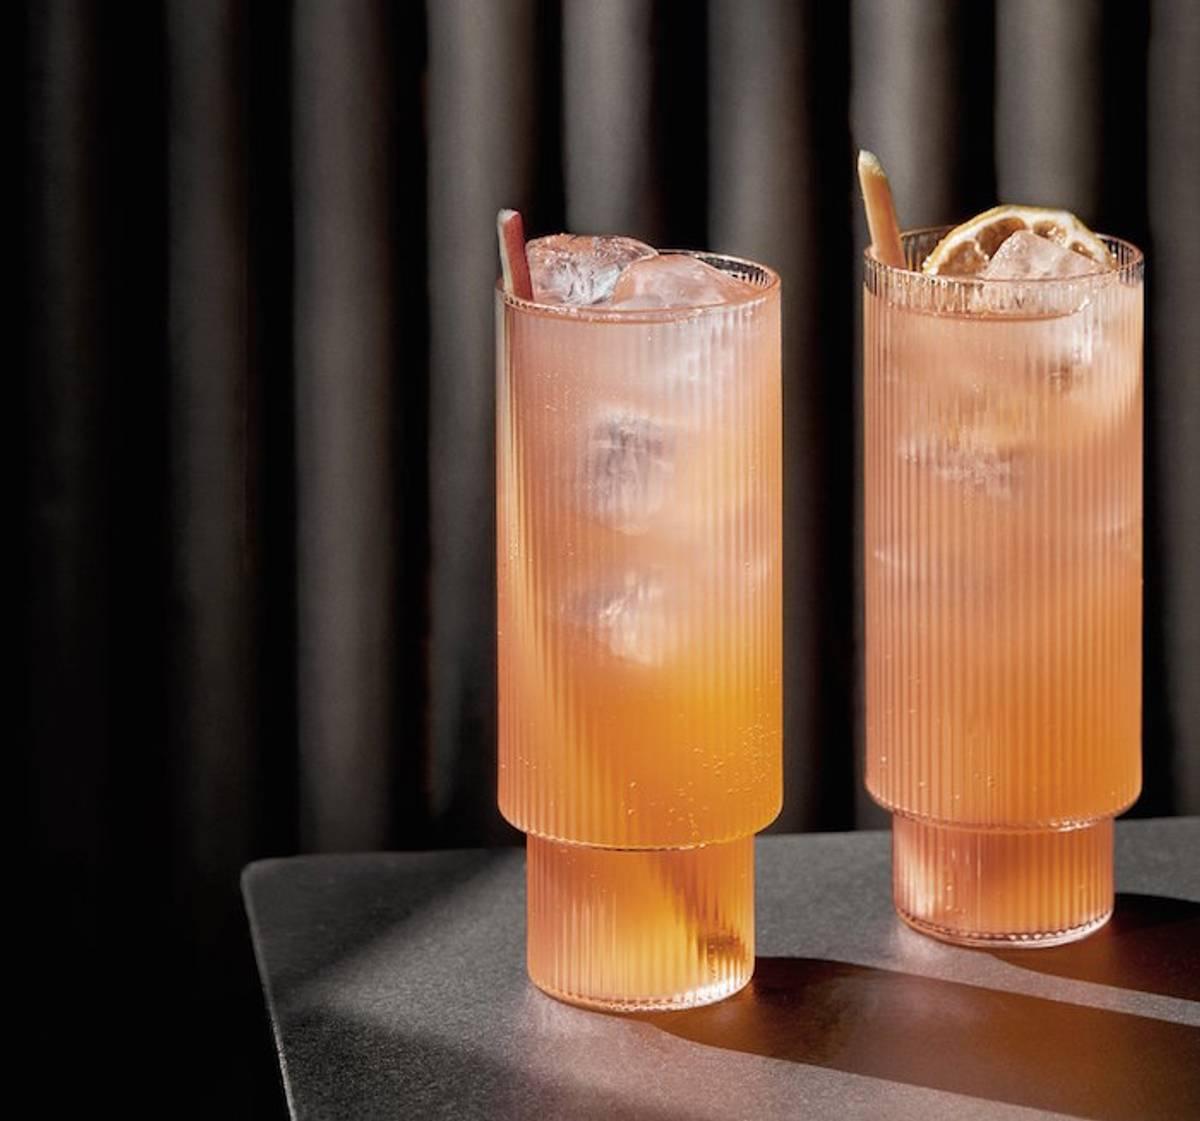 Ferm Living Ripple longdrink glass 4 pk